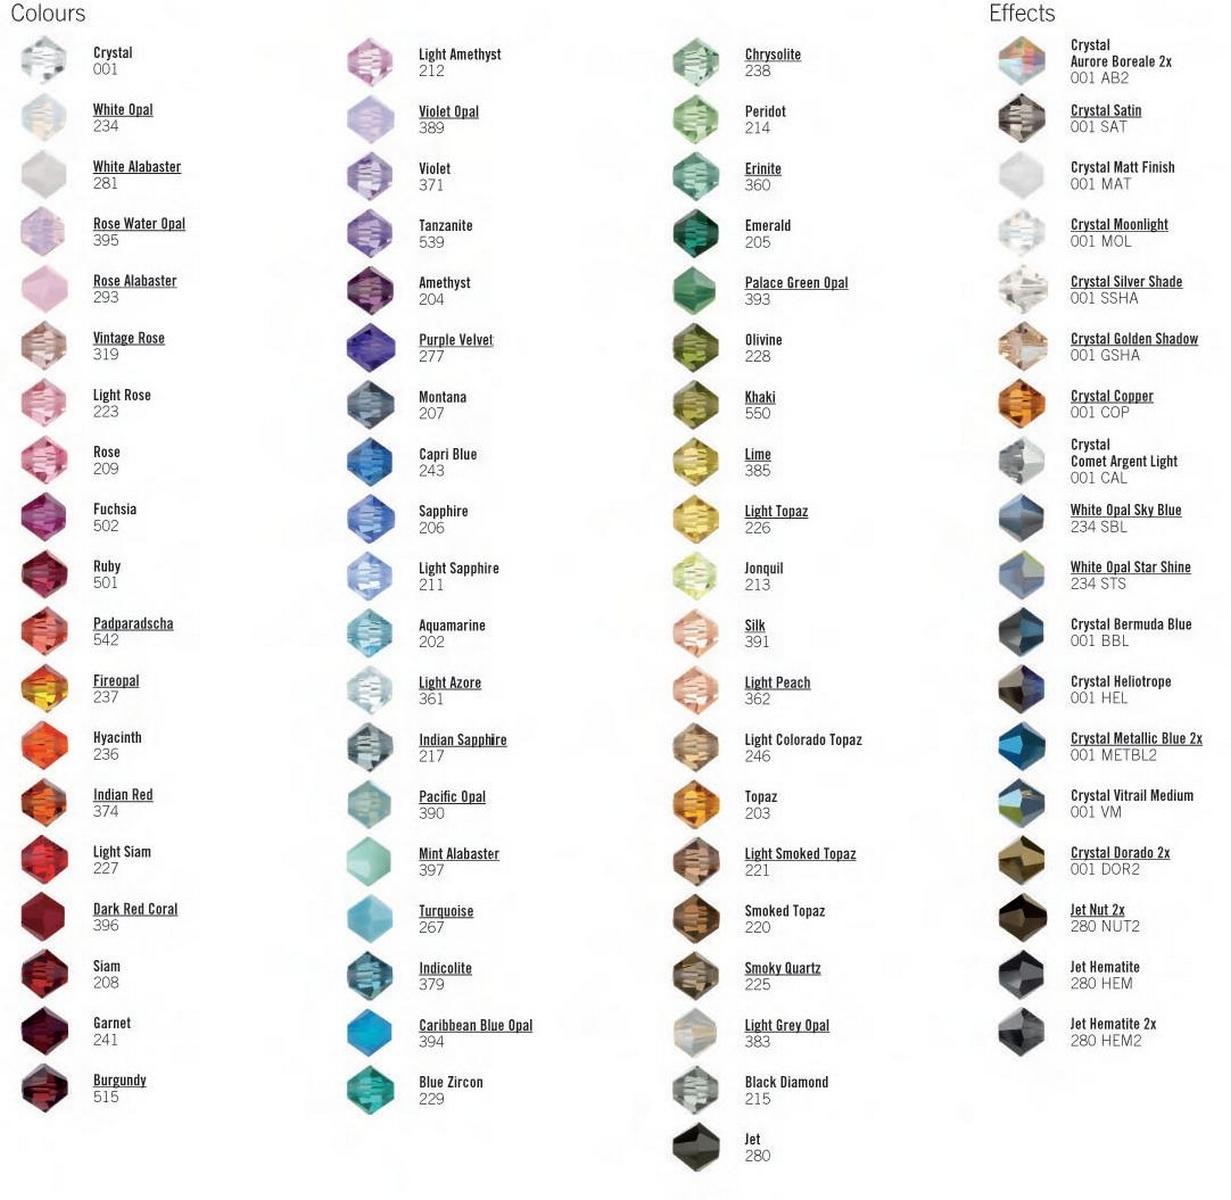 Venta de anillos swarovski catalogo colores tupies swarovski for Swarovski italia catalogo